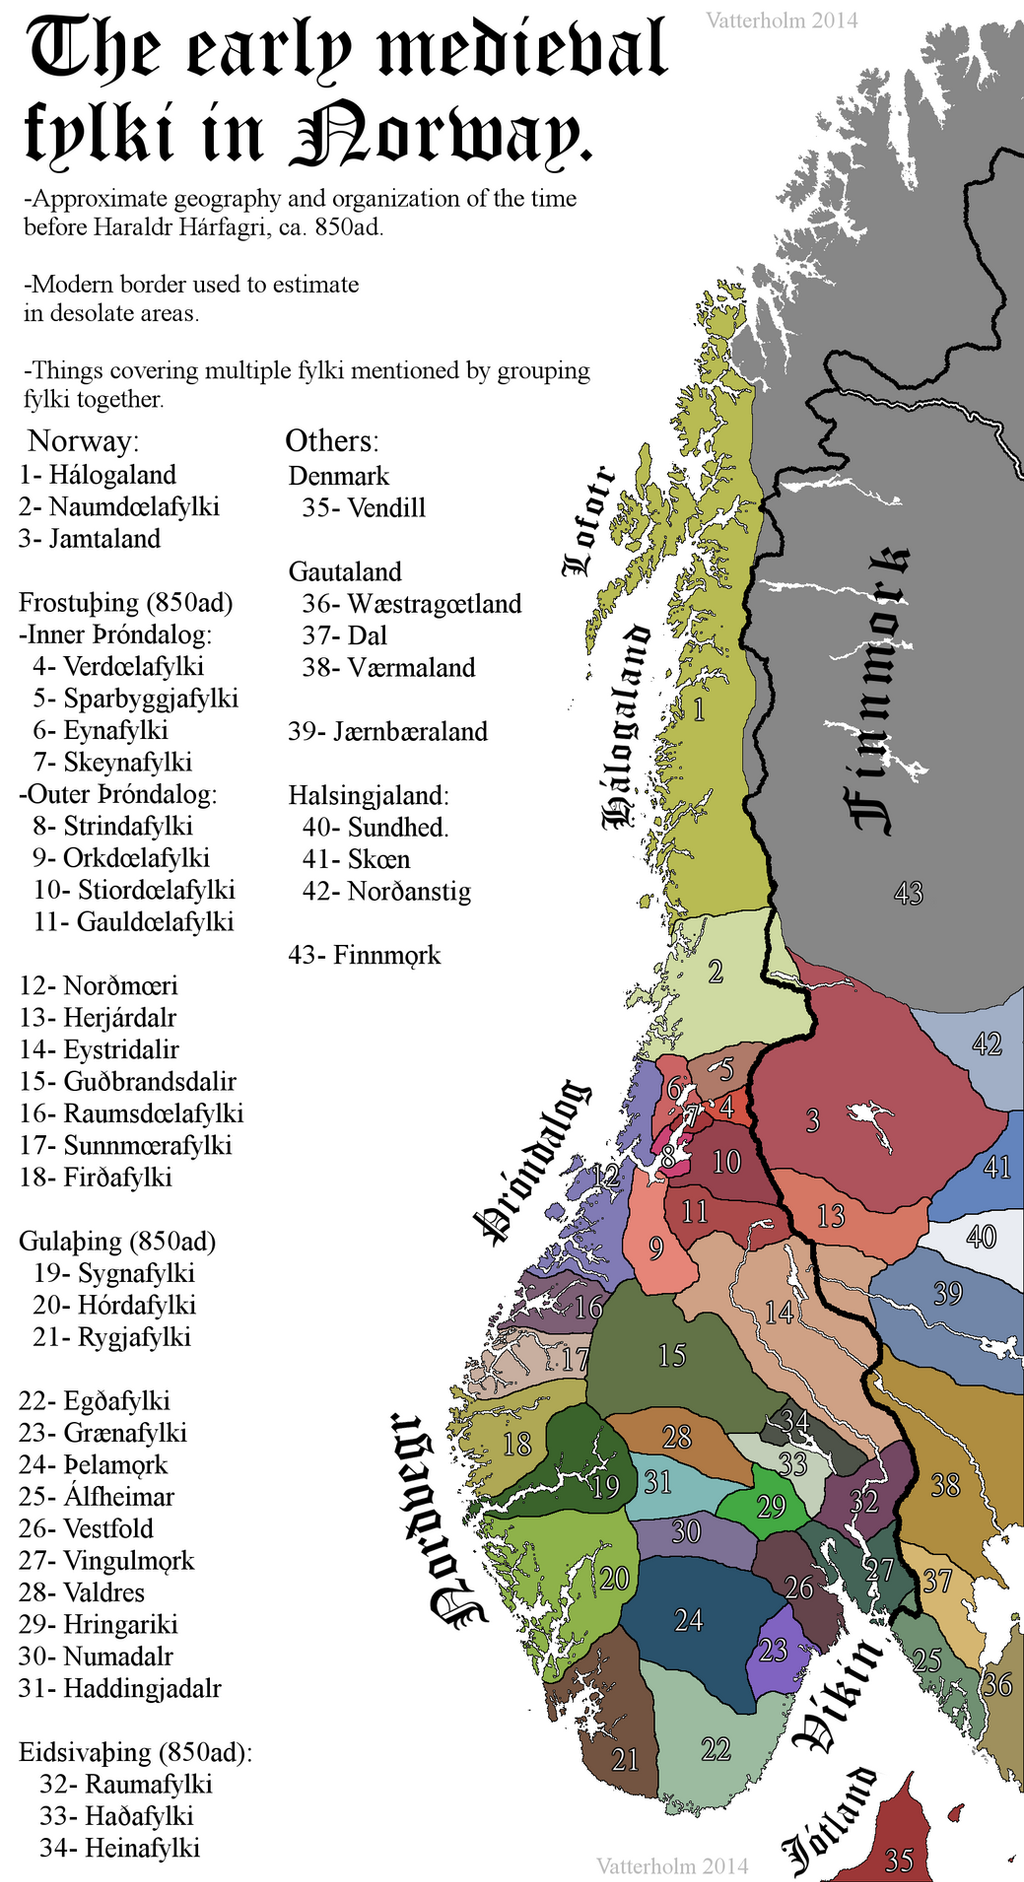 OC The Vikingage Fylki Petty Kingdoms In Norway Before The - Norway map vikings